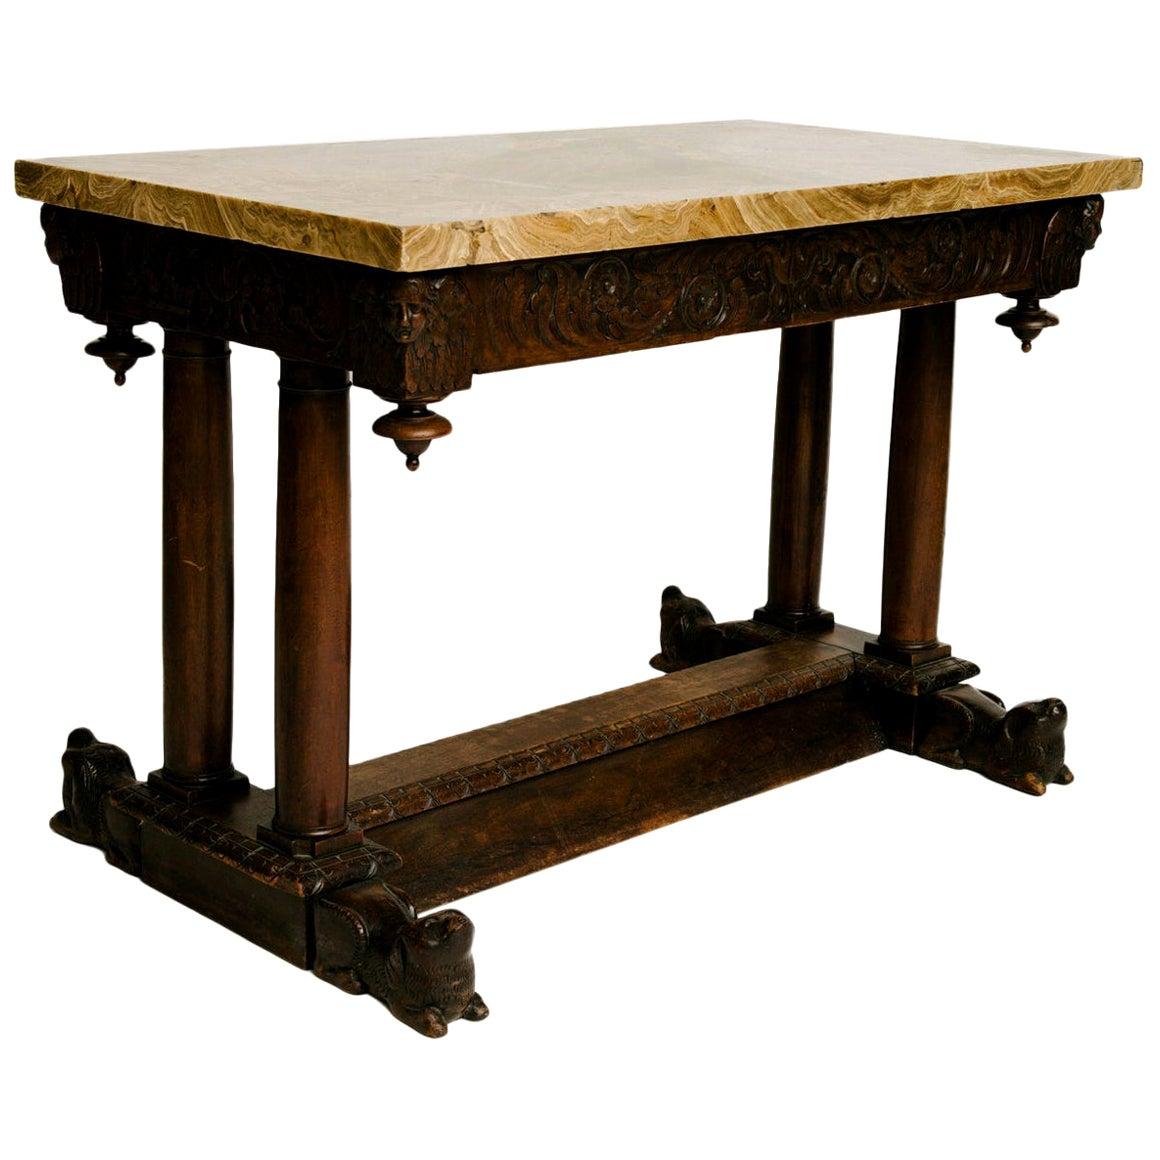 17th Century Italian Center Table